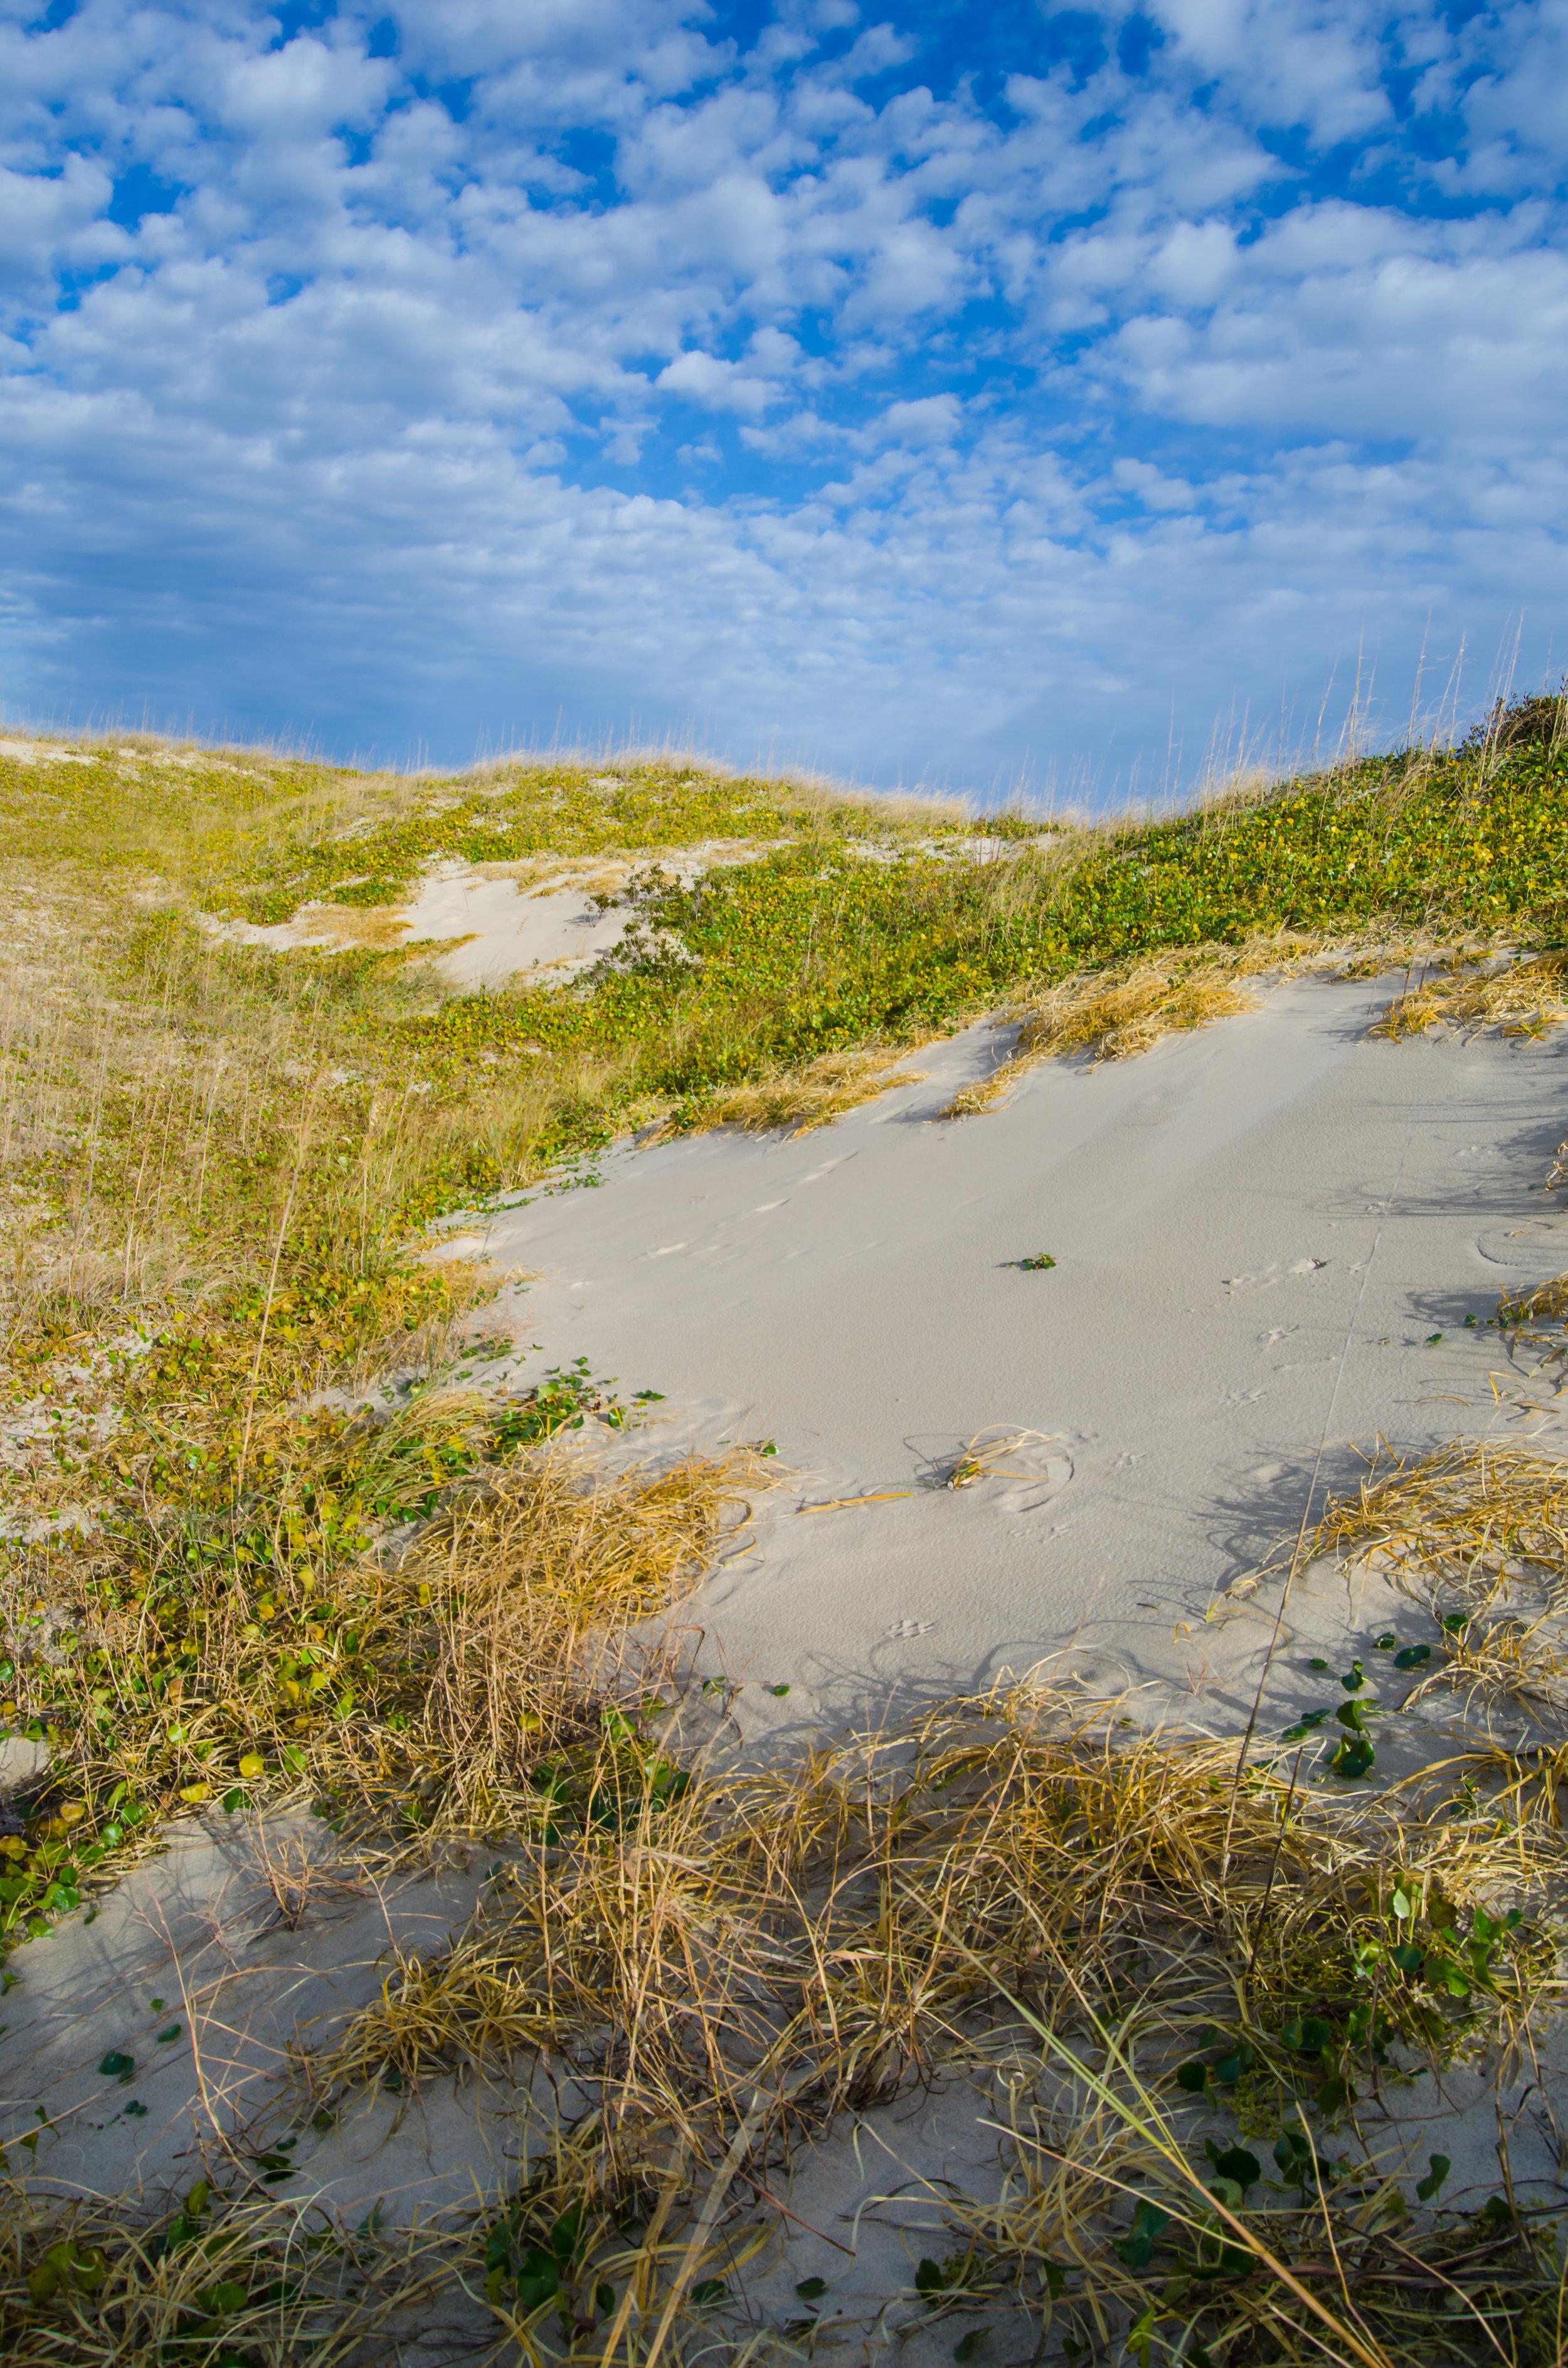 False Cape Colors - Sand dunes against a blue sky at False Cape State Park in Virginia Beach, Virginia_.jpg